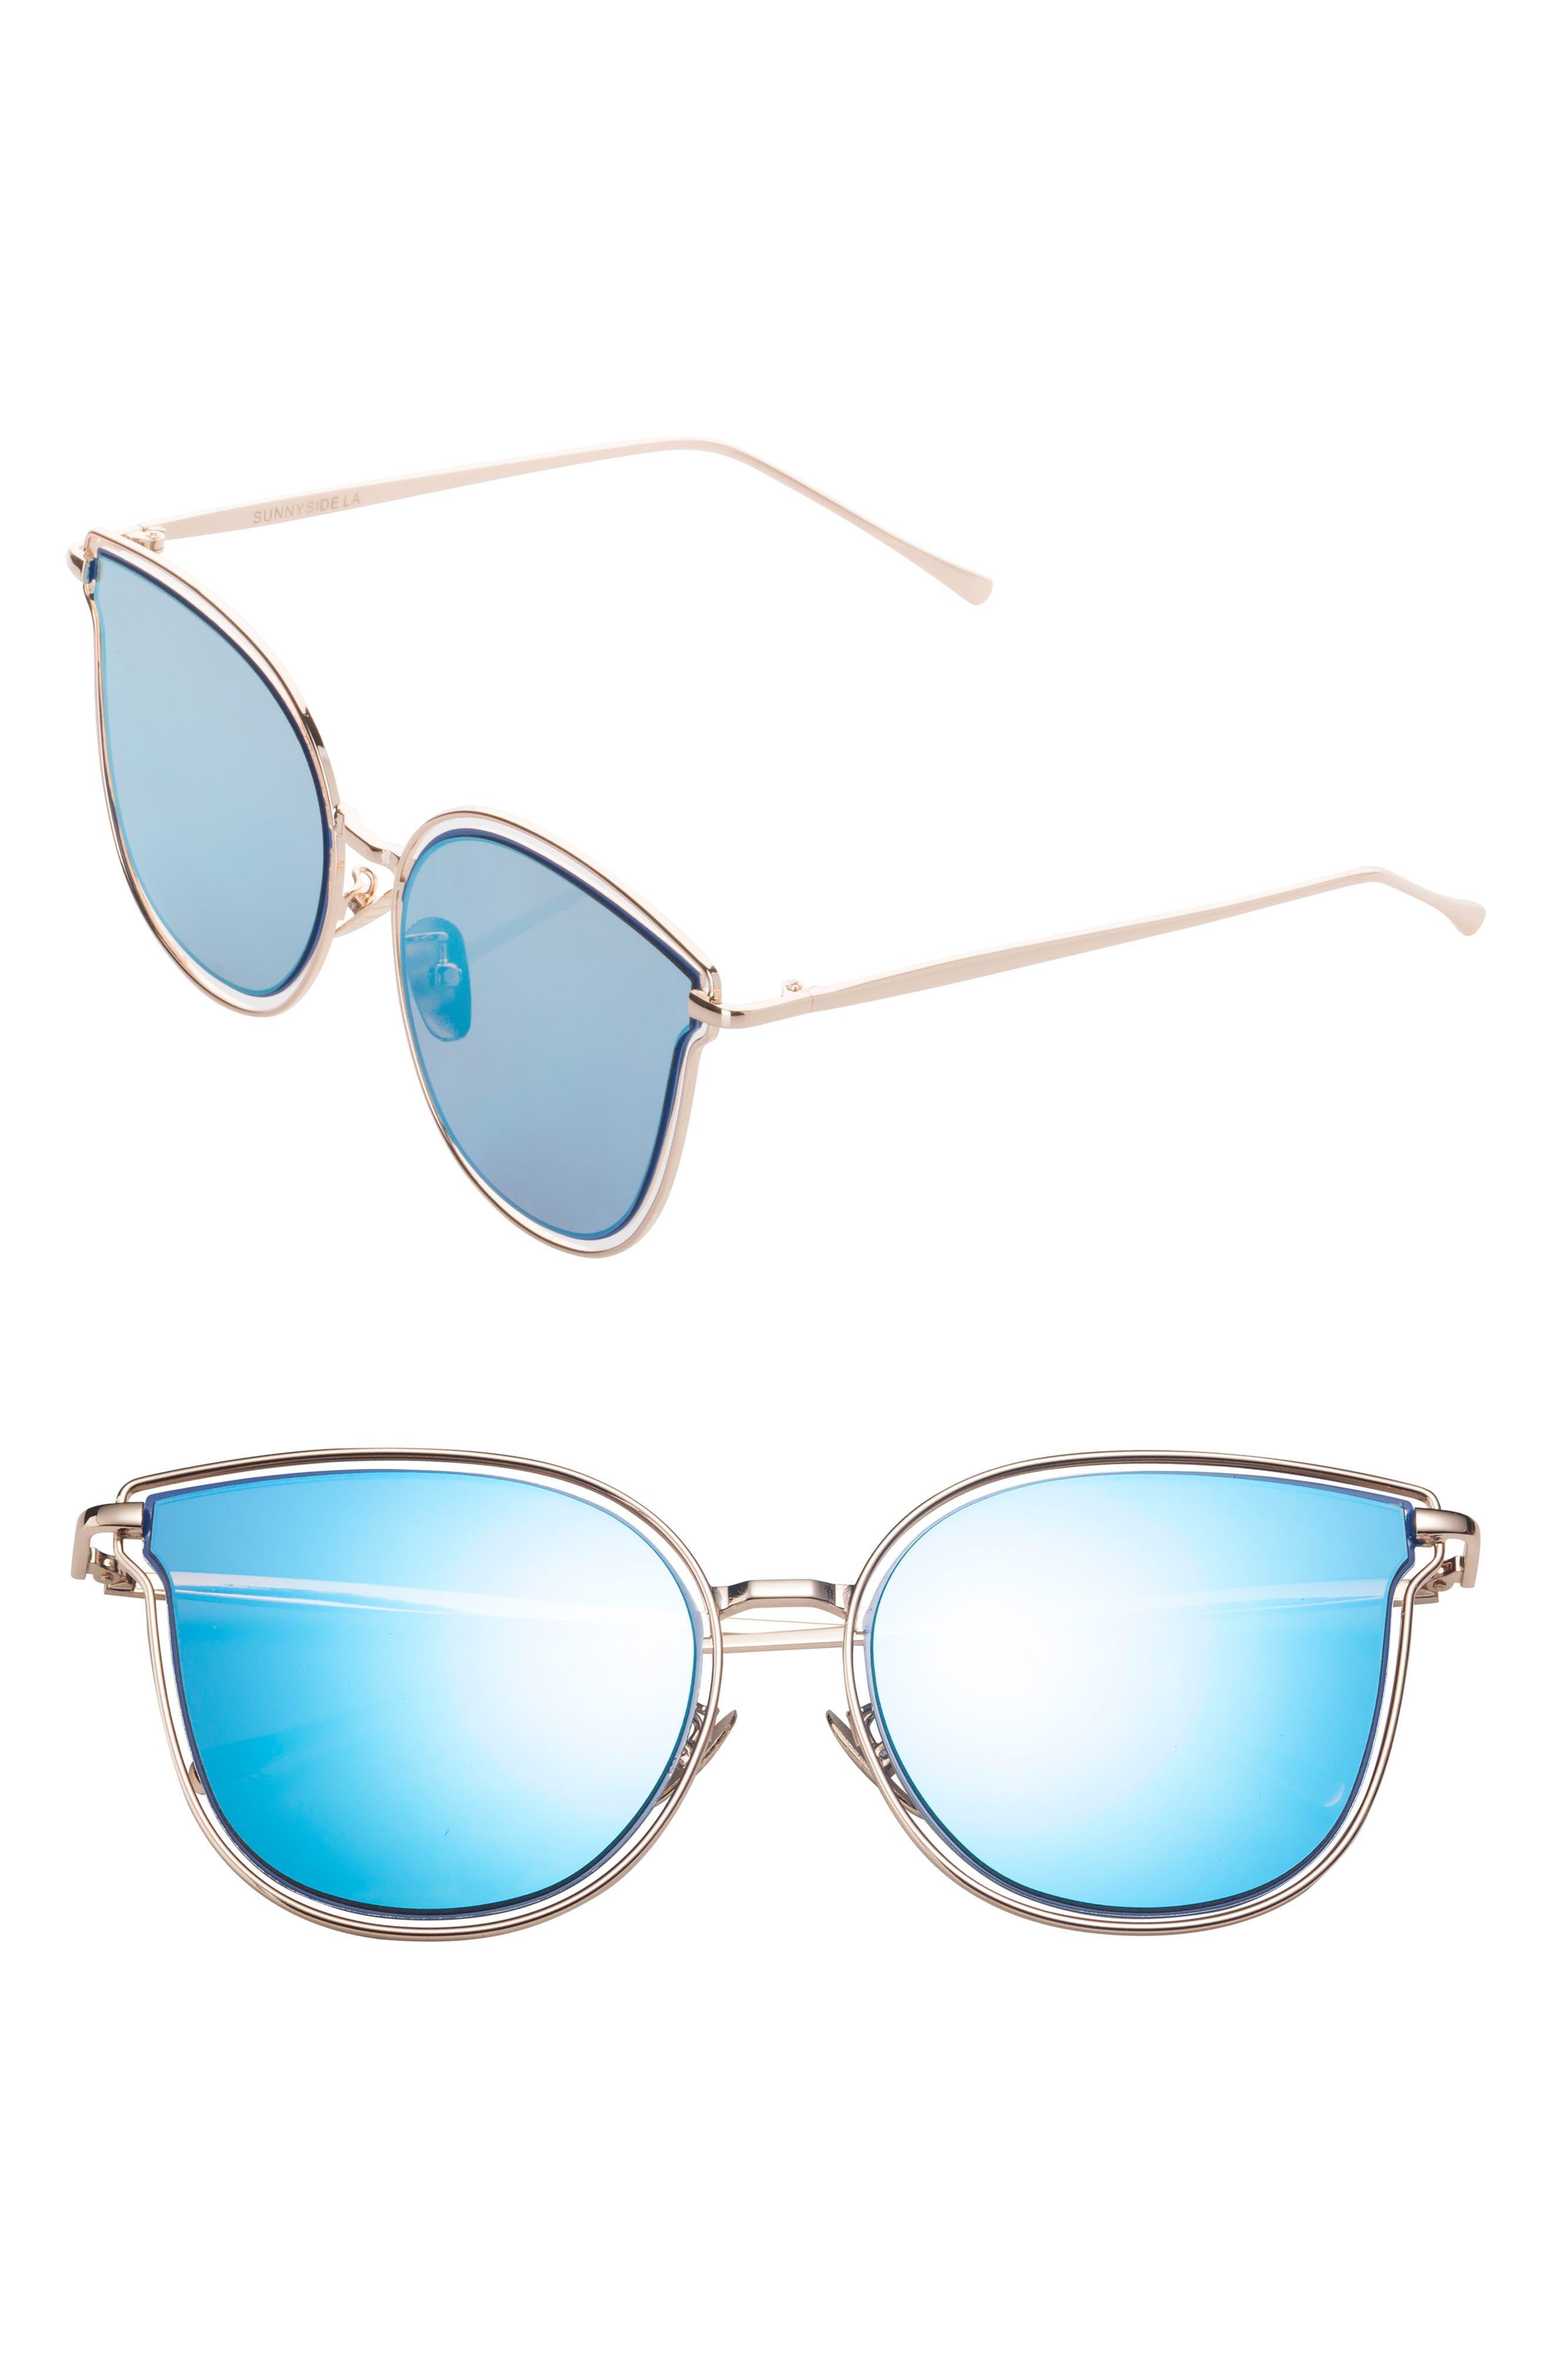 54mm Sunglasses,                             Main thumbnail 1, color,                             401